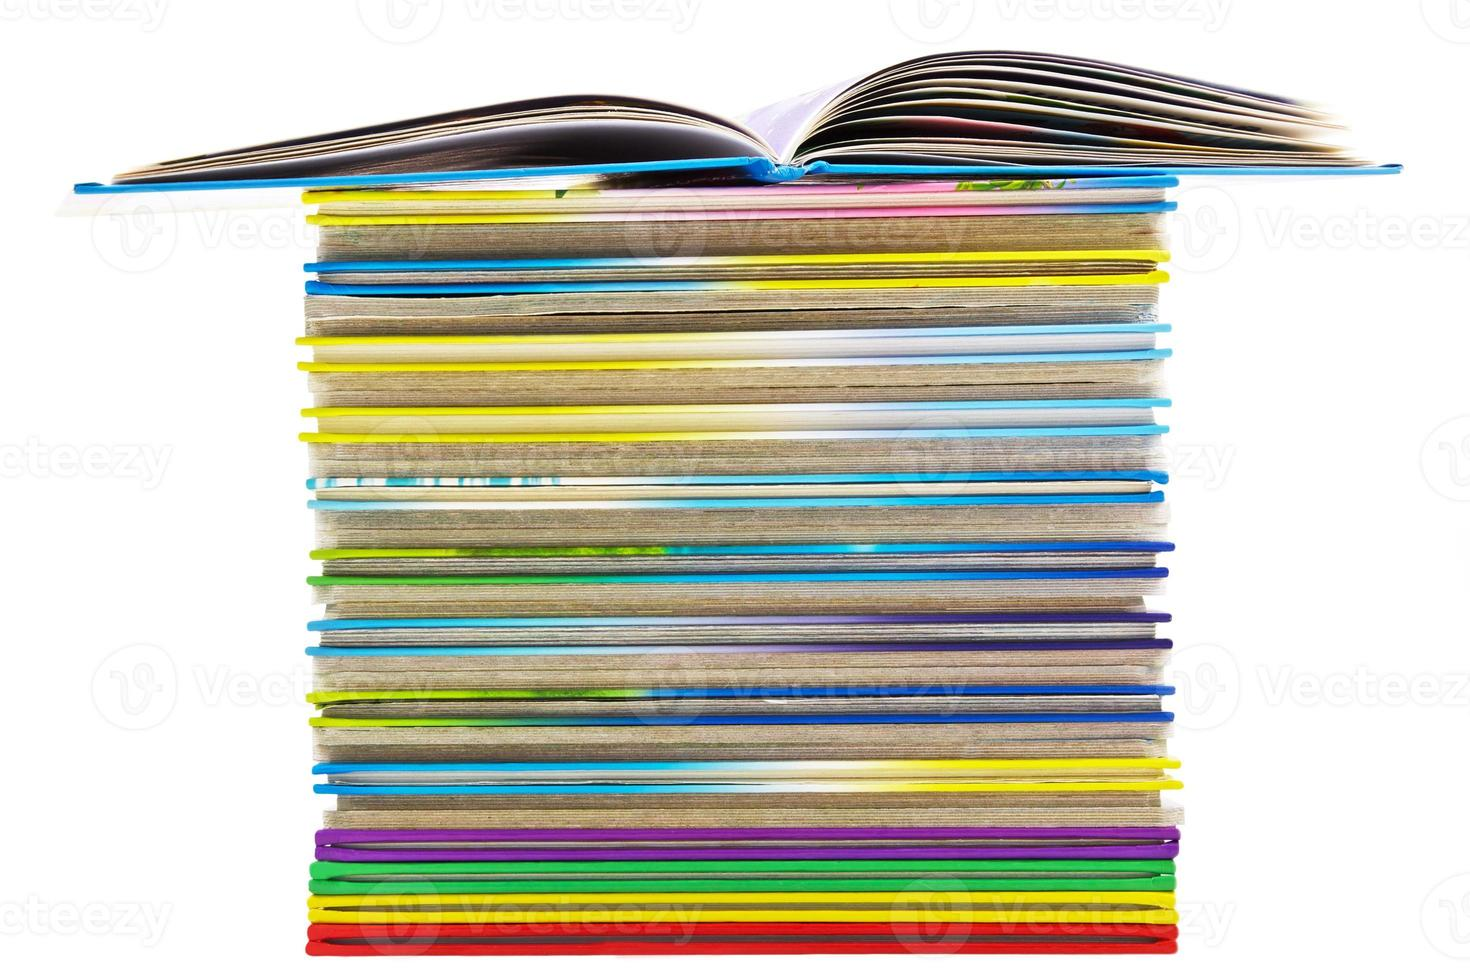 stack of thin books photo